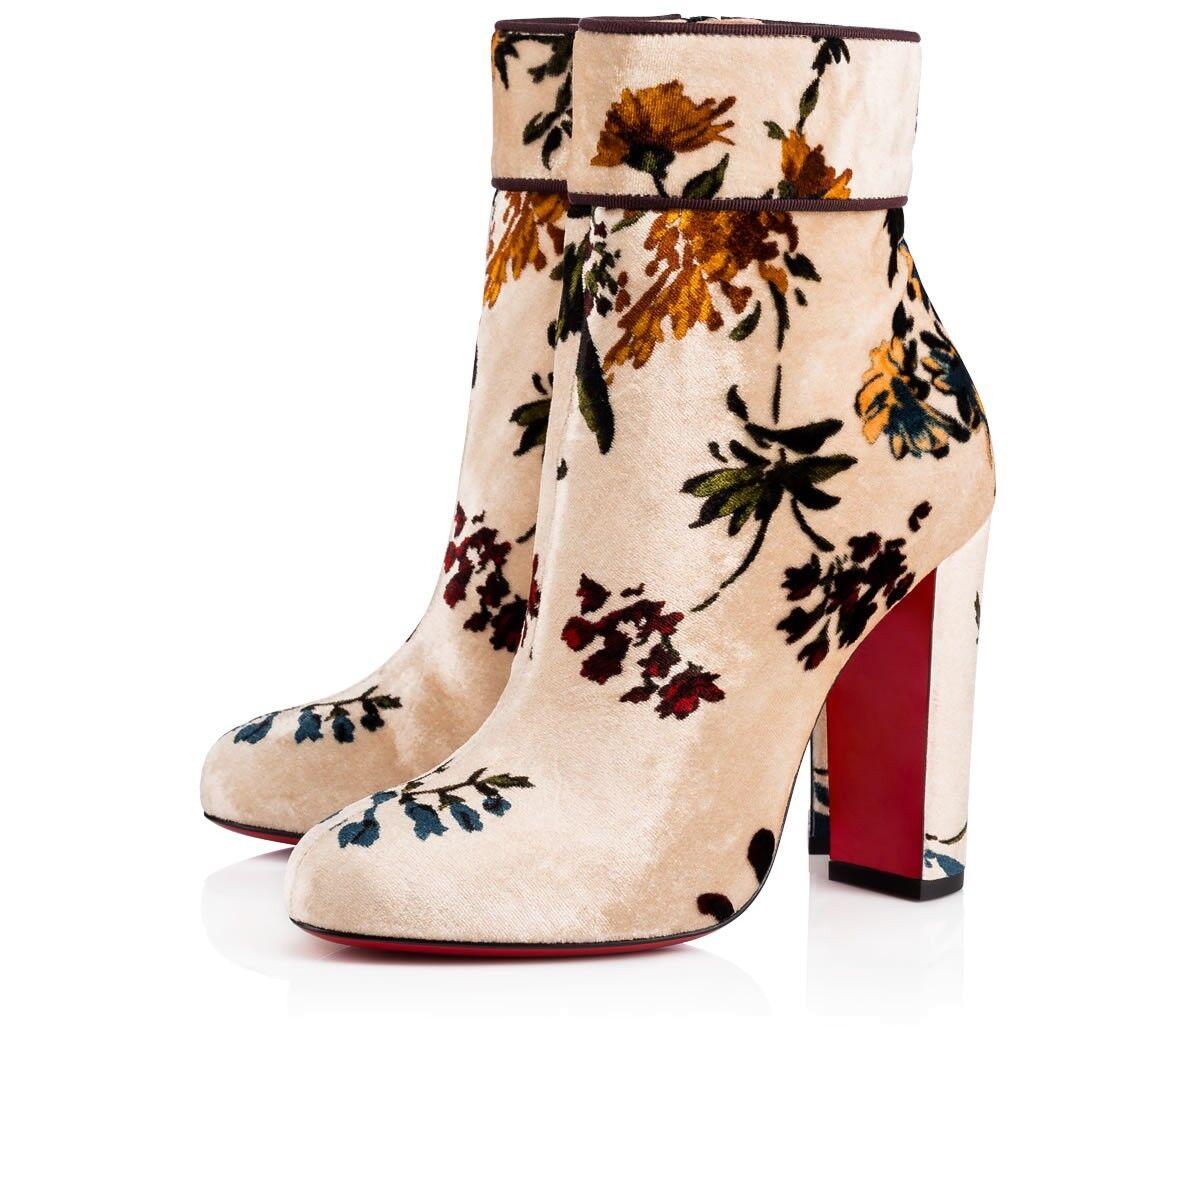 NIB Christian Louboutin Moulamax 100 Heel Nude ROT Velvet Floral Heel 100 Bootie Boot 35 052156